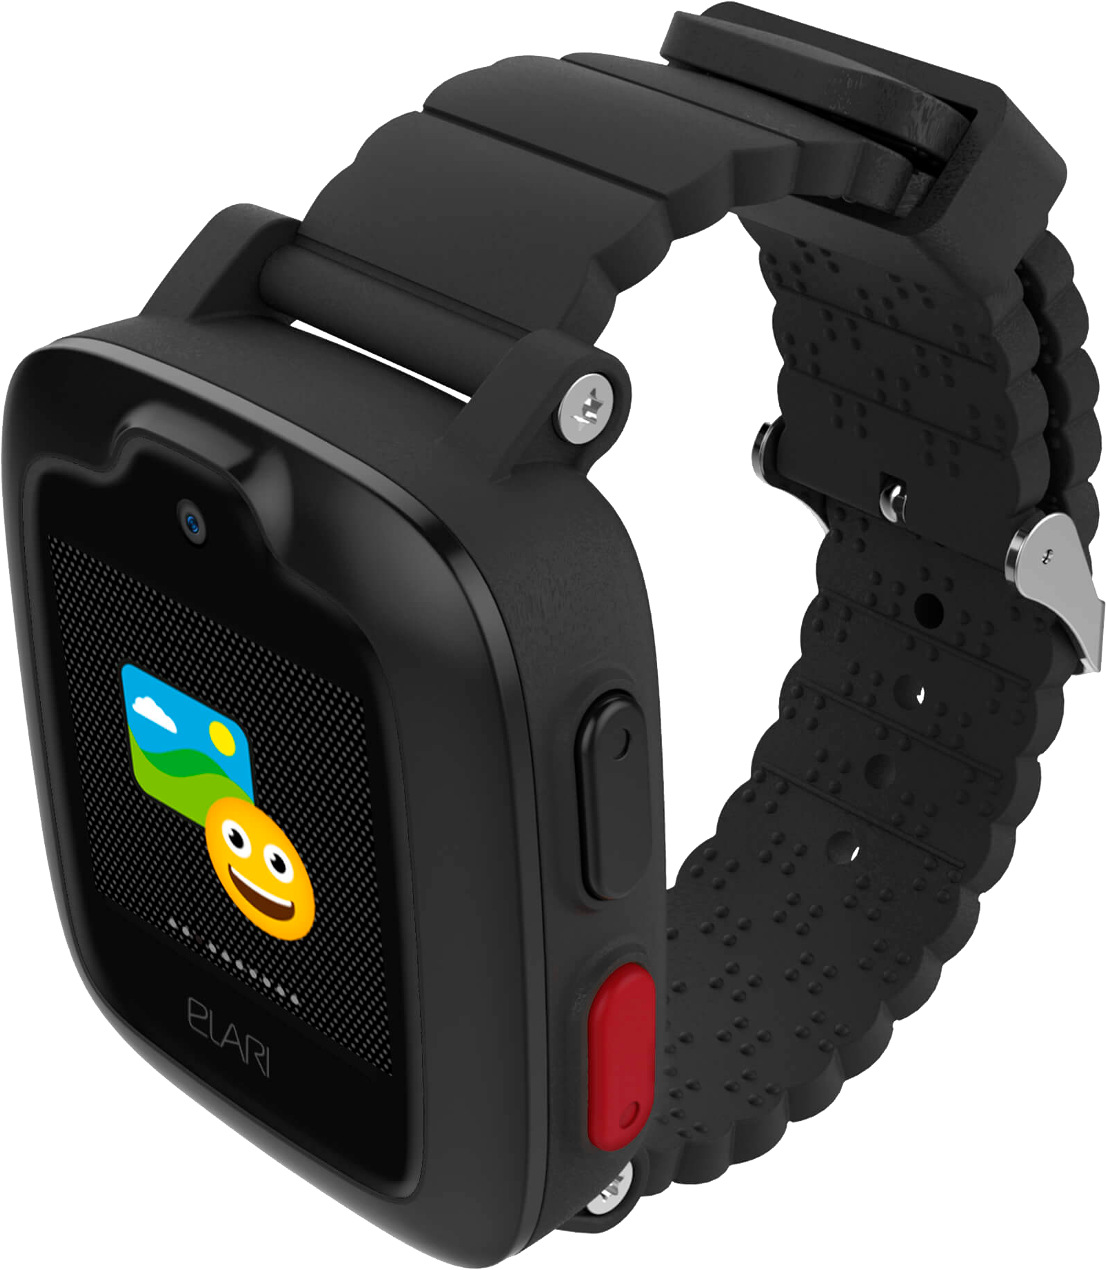 ELARI KidPhone 3G - купить детский маячок  цены ffa0b032f7963